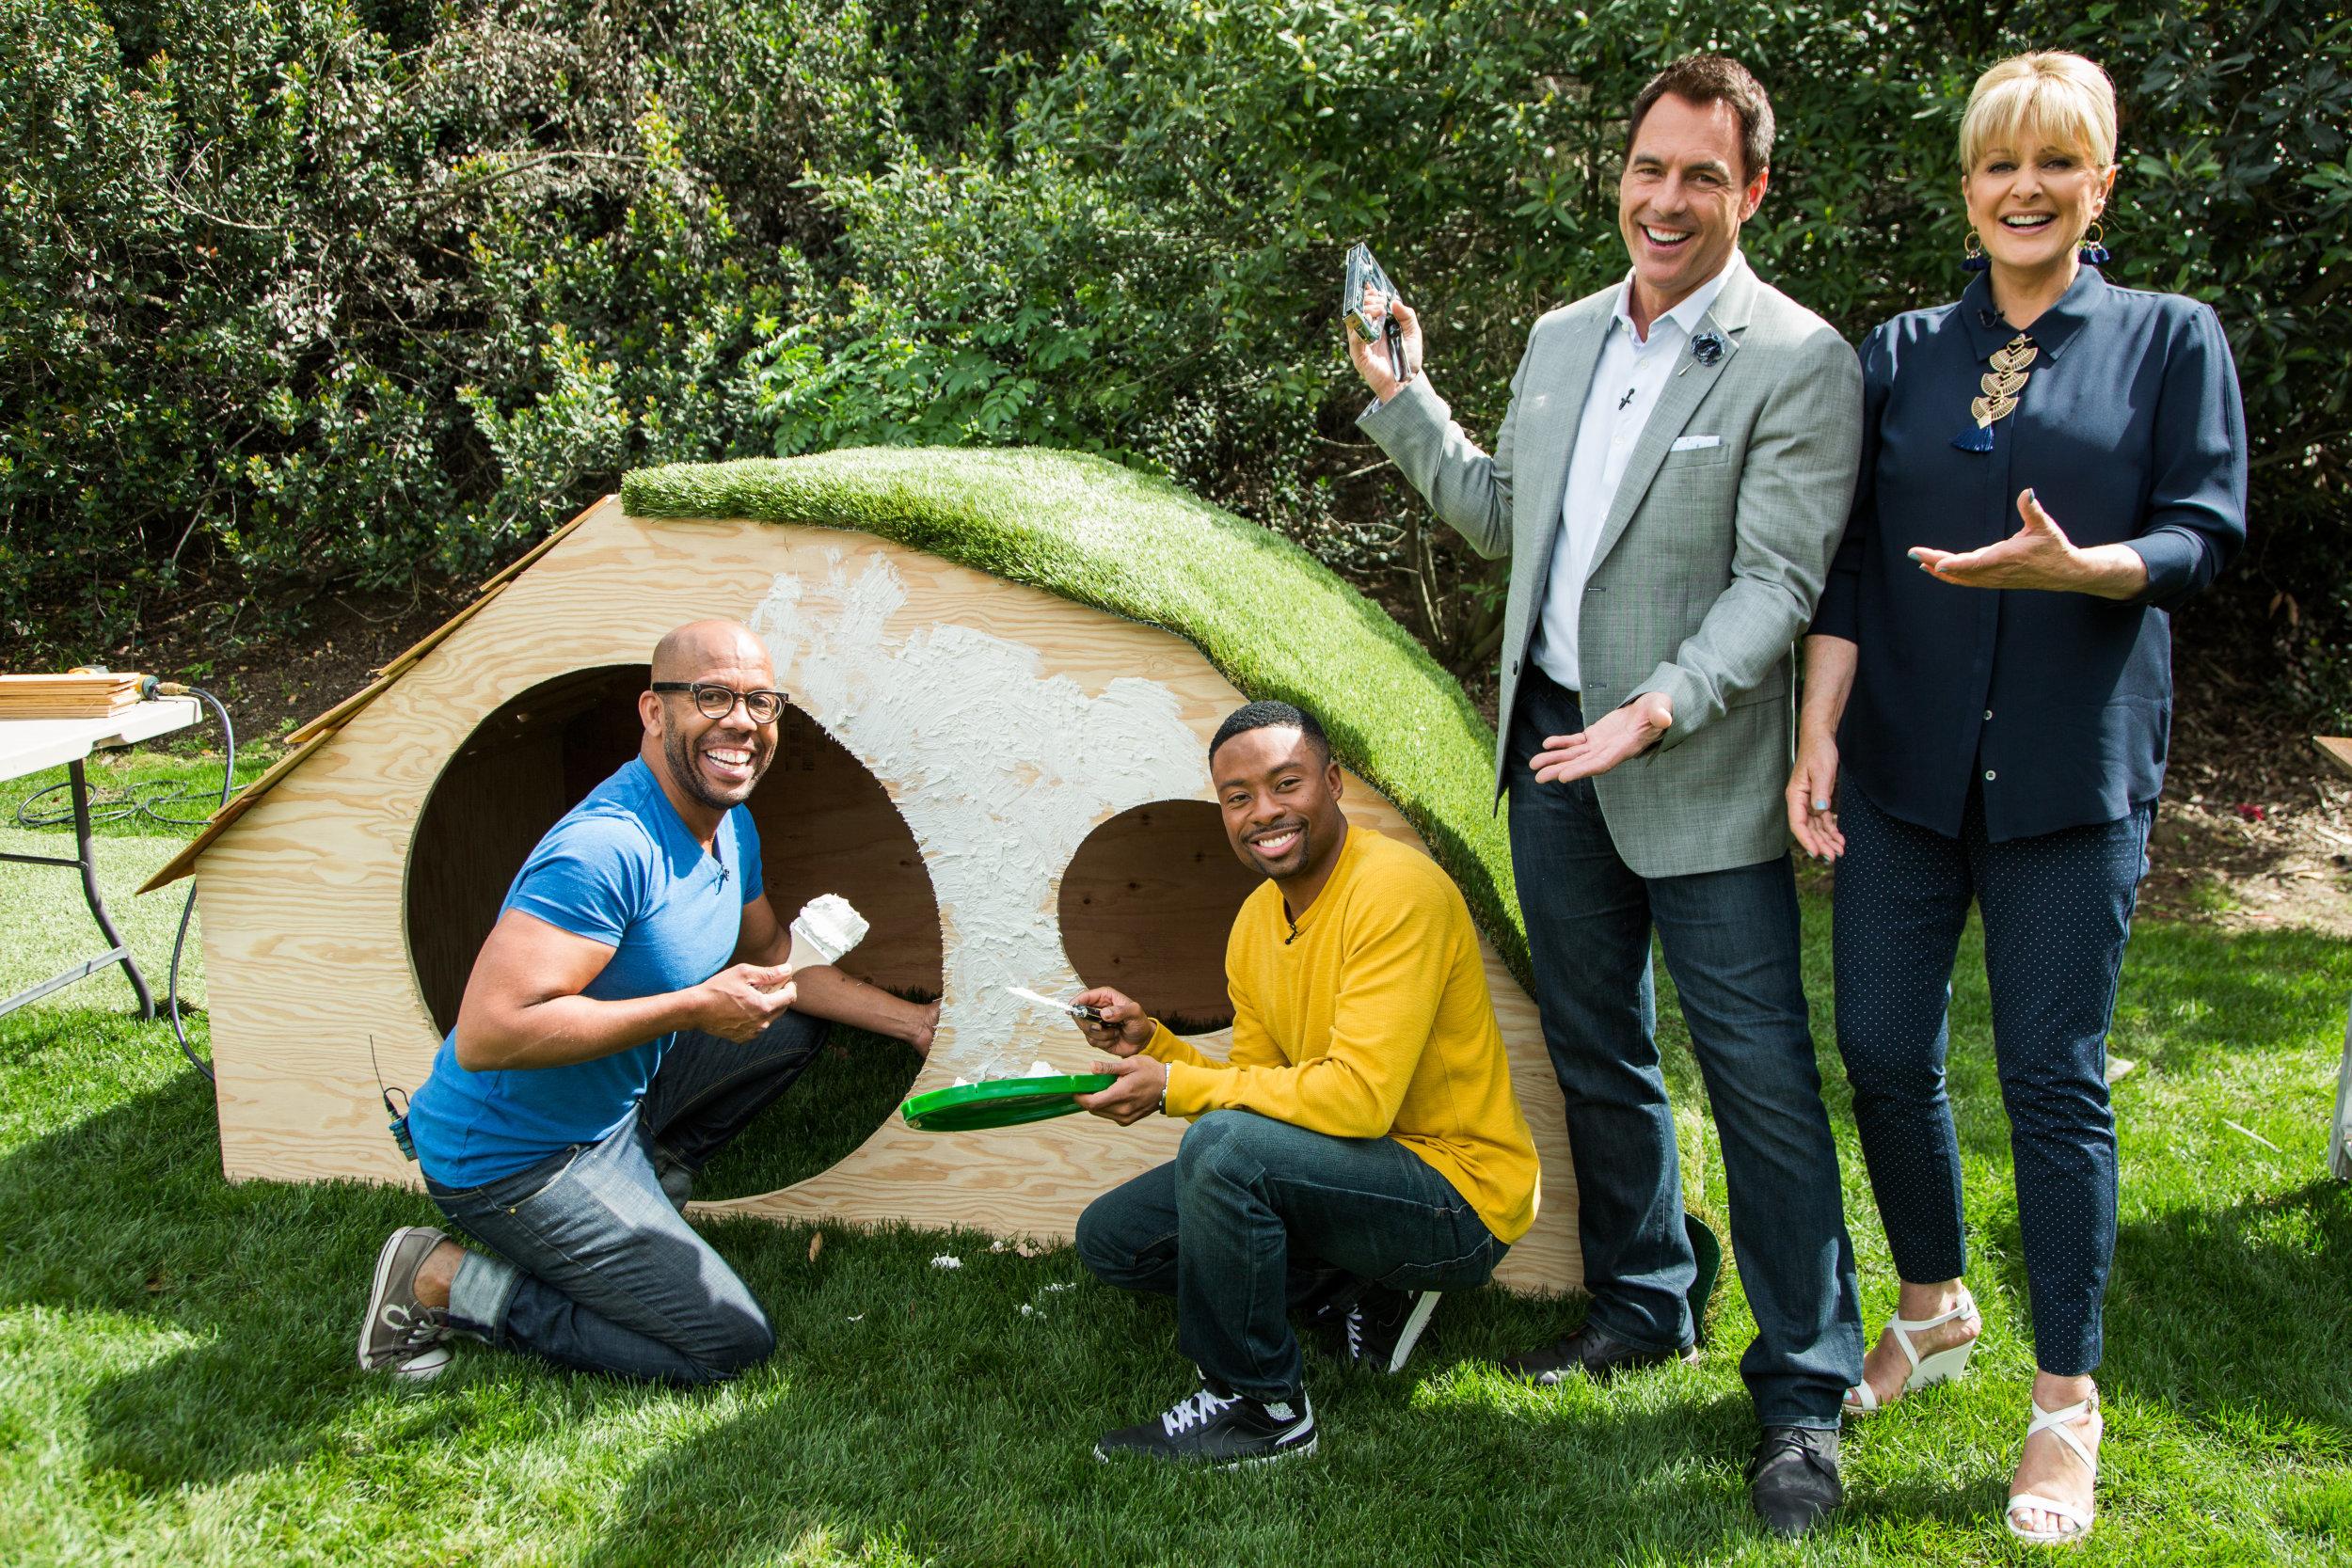 How To Diy Hobbit Hole Playhouse